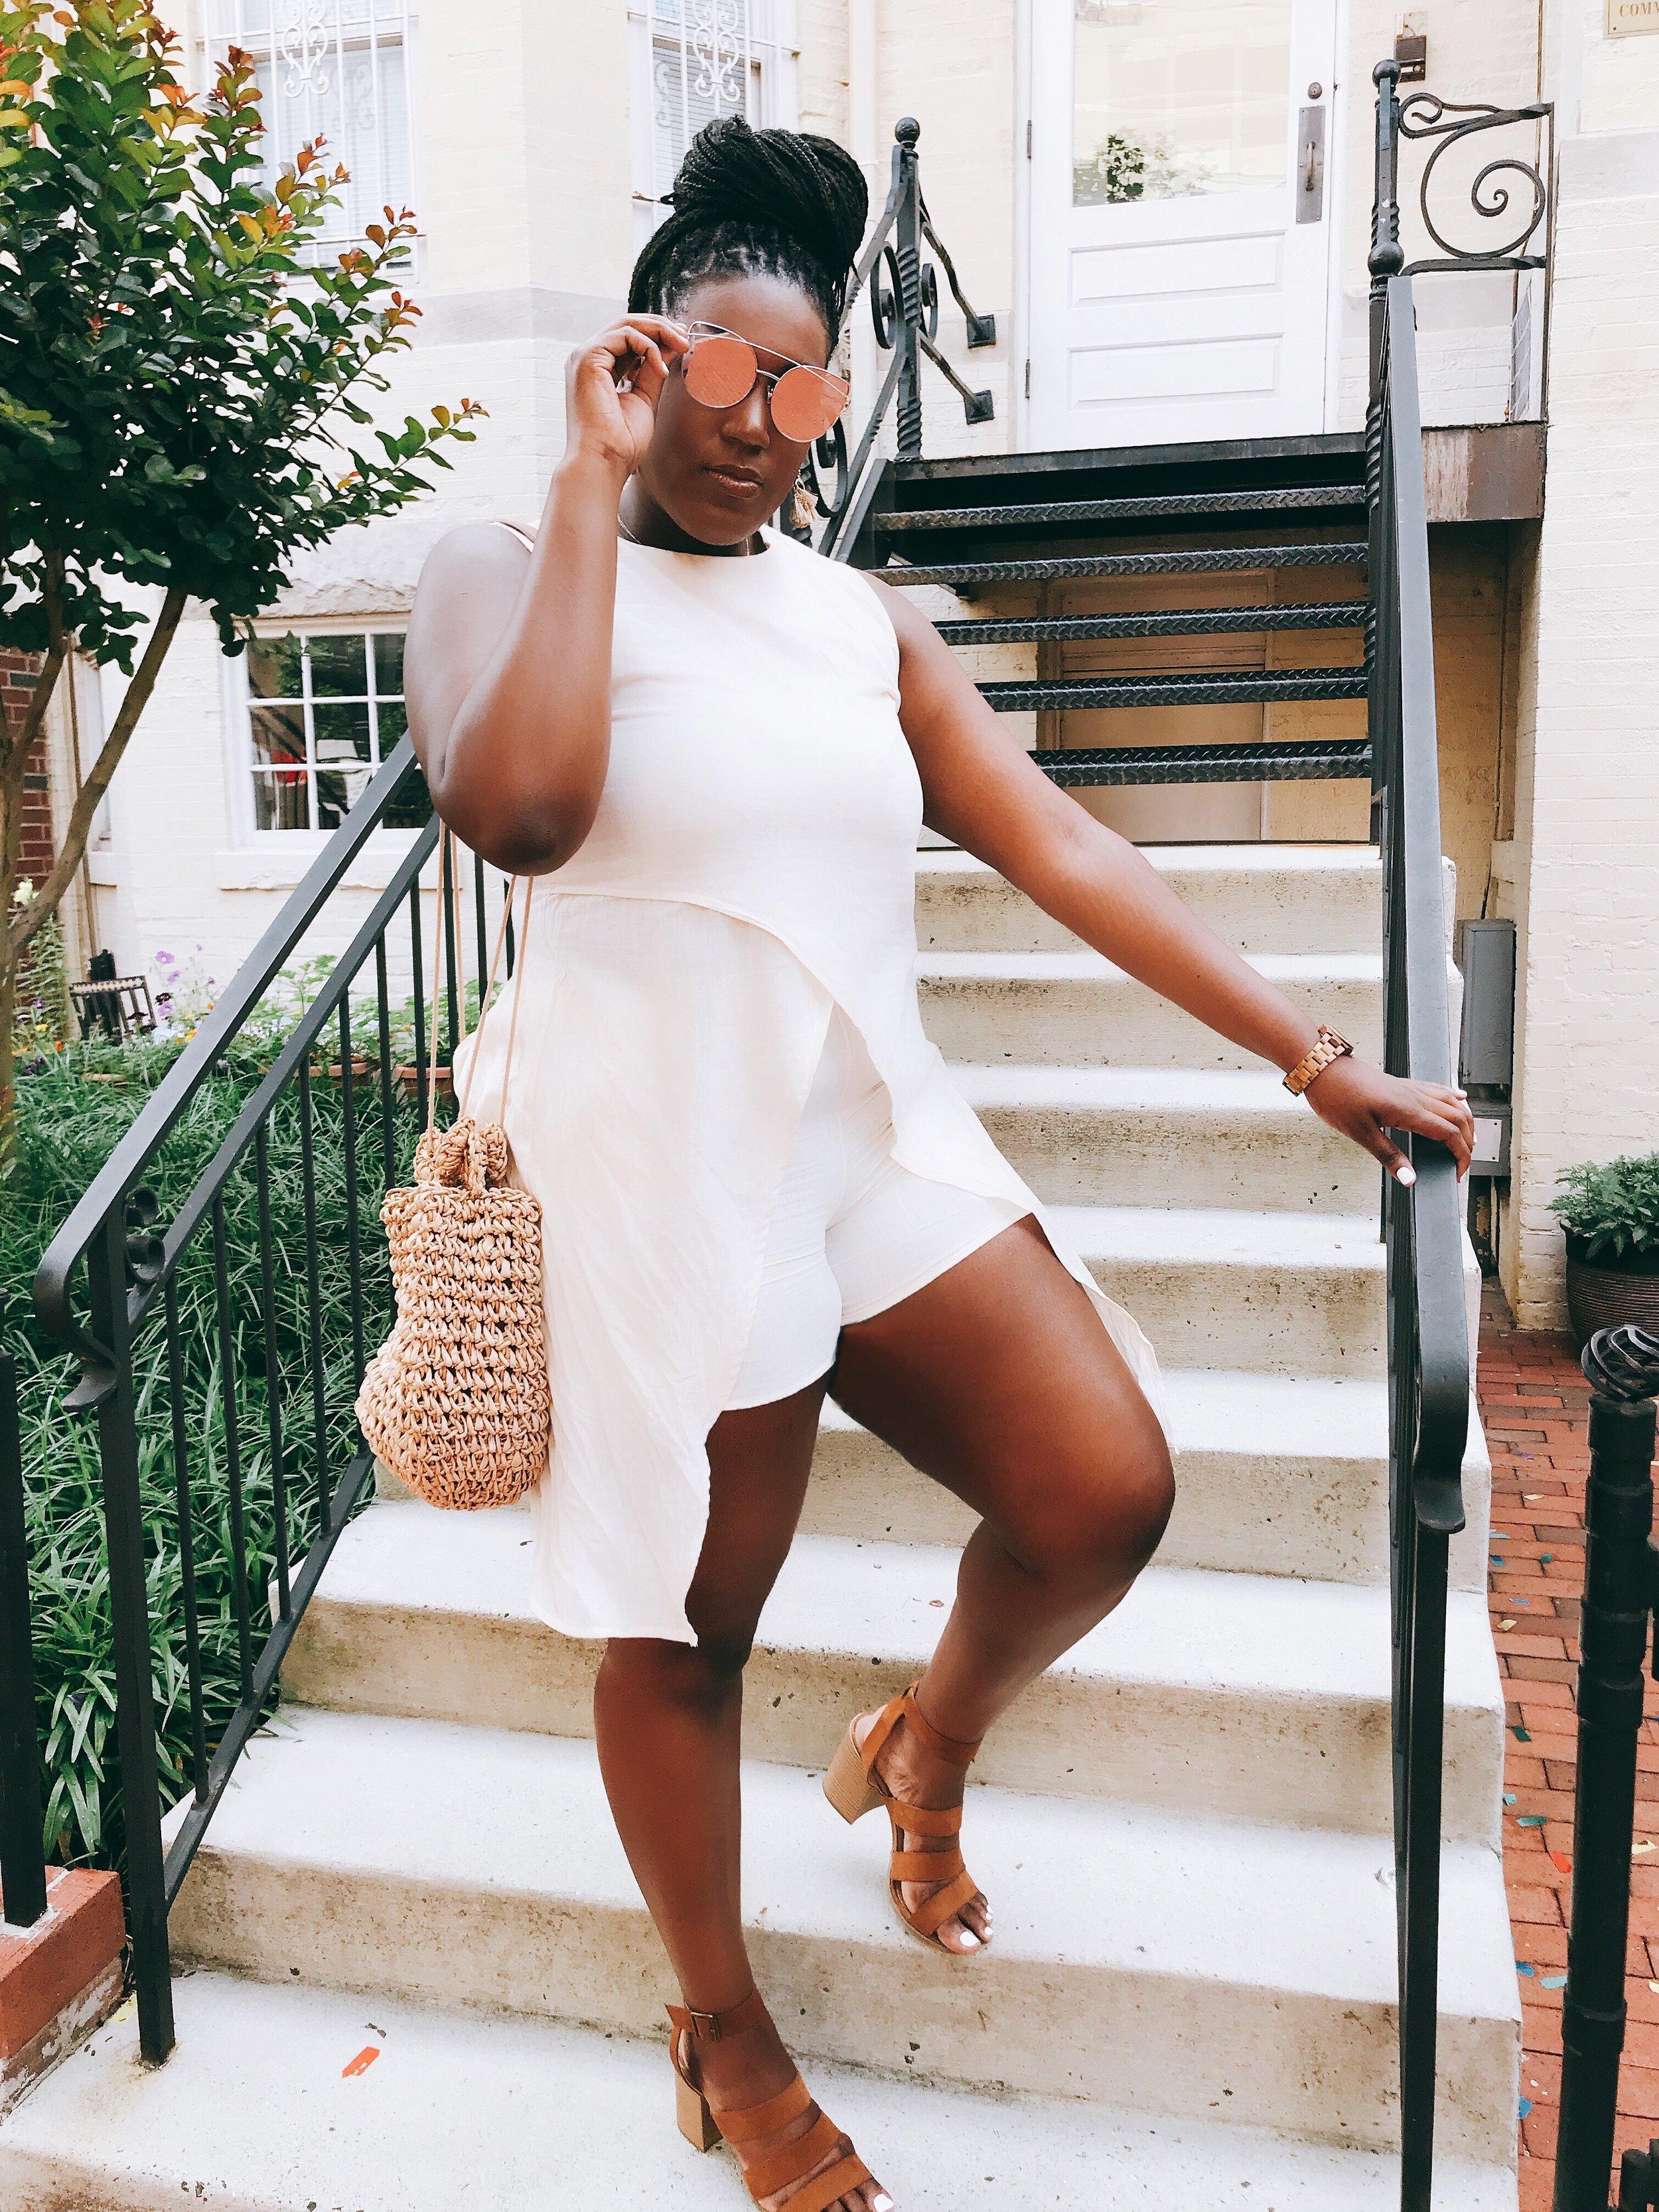 Shein Plus Size Review Charmaine Charmant